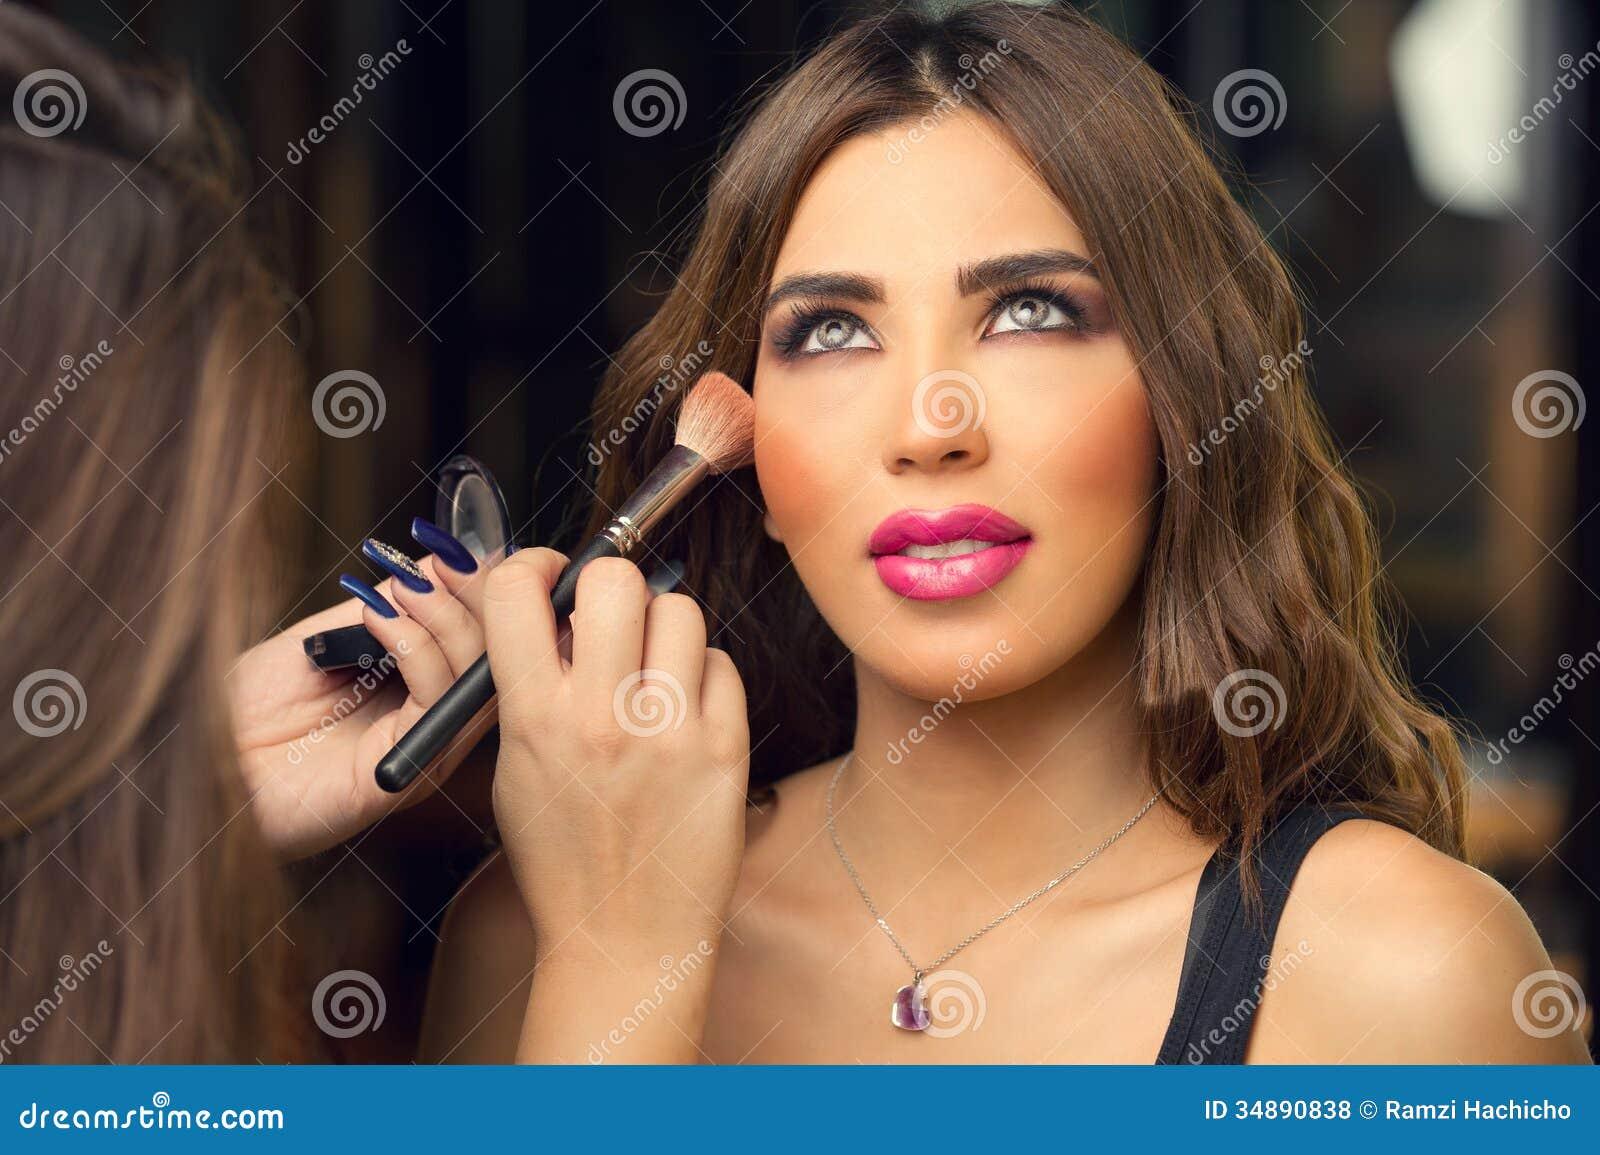 Makeup Artist Applying Make Up On Beautiful Model Royalty ...